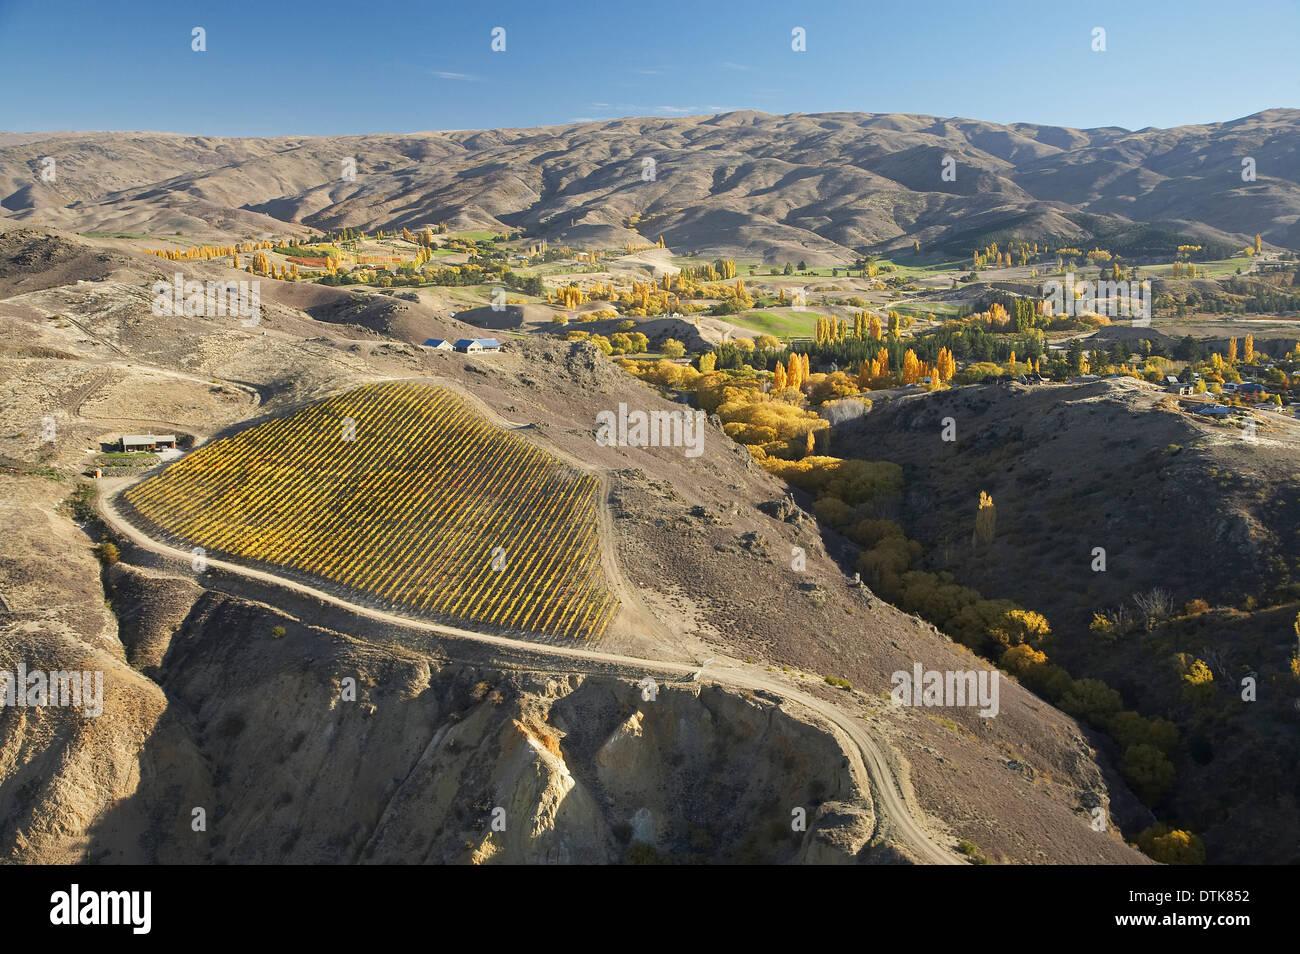 Vineyard and Carrick Range, Bannockburn, Central Otago, South Island, New Zealand - aerial - Stock Image